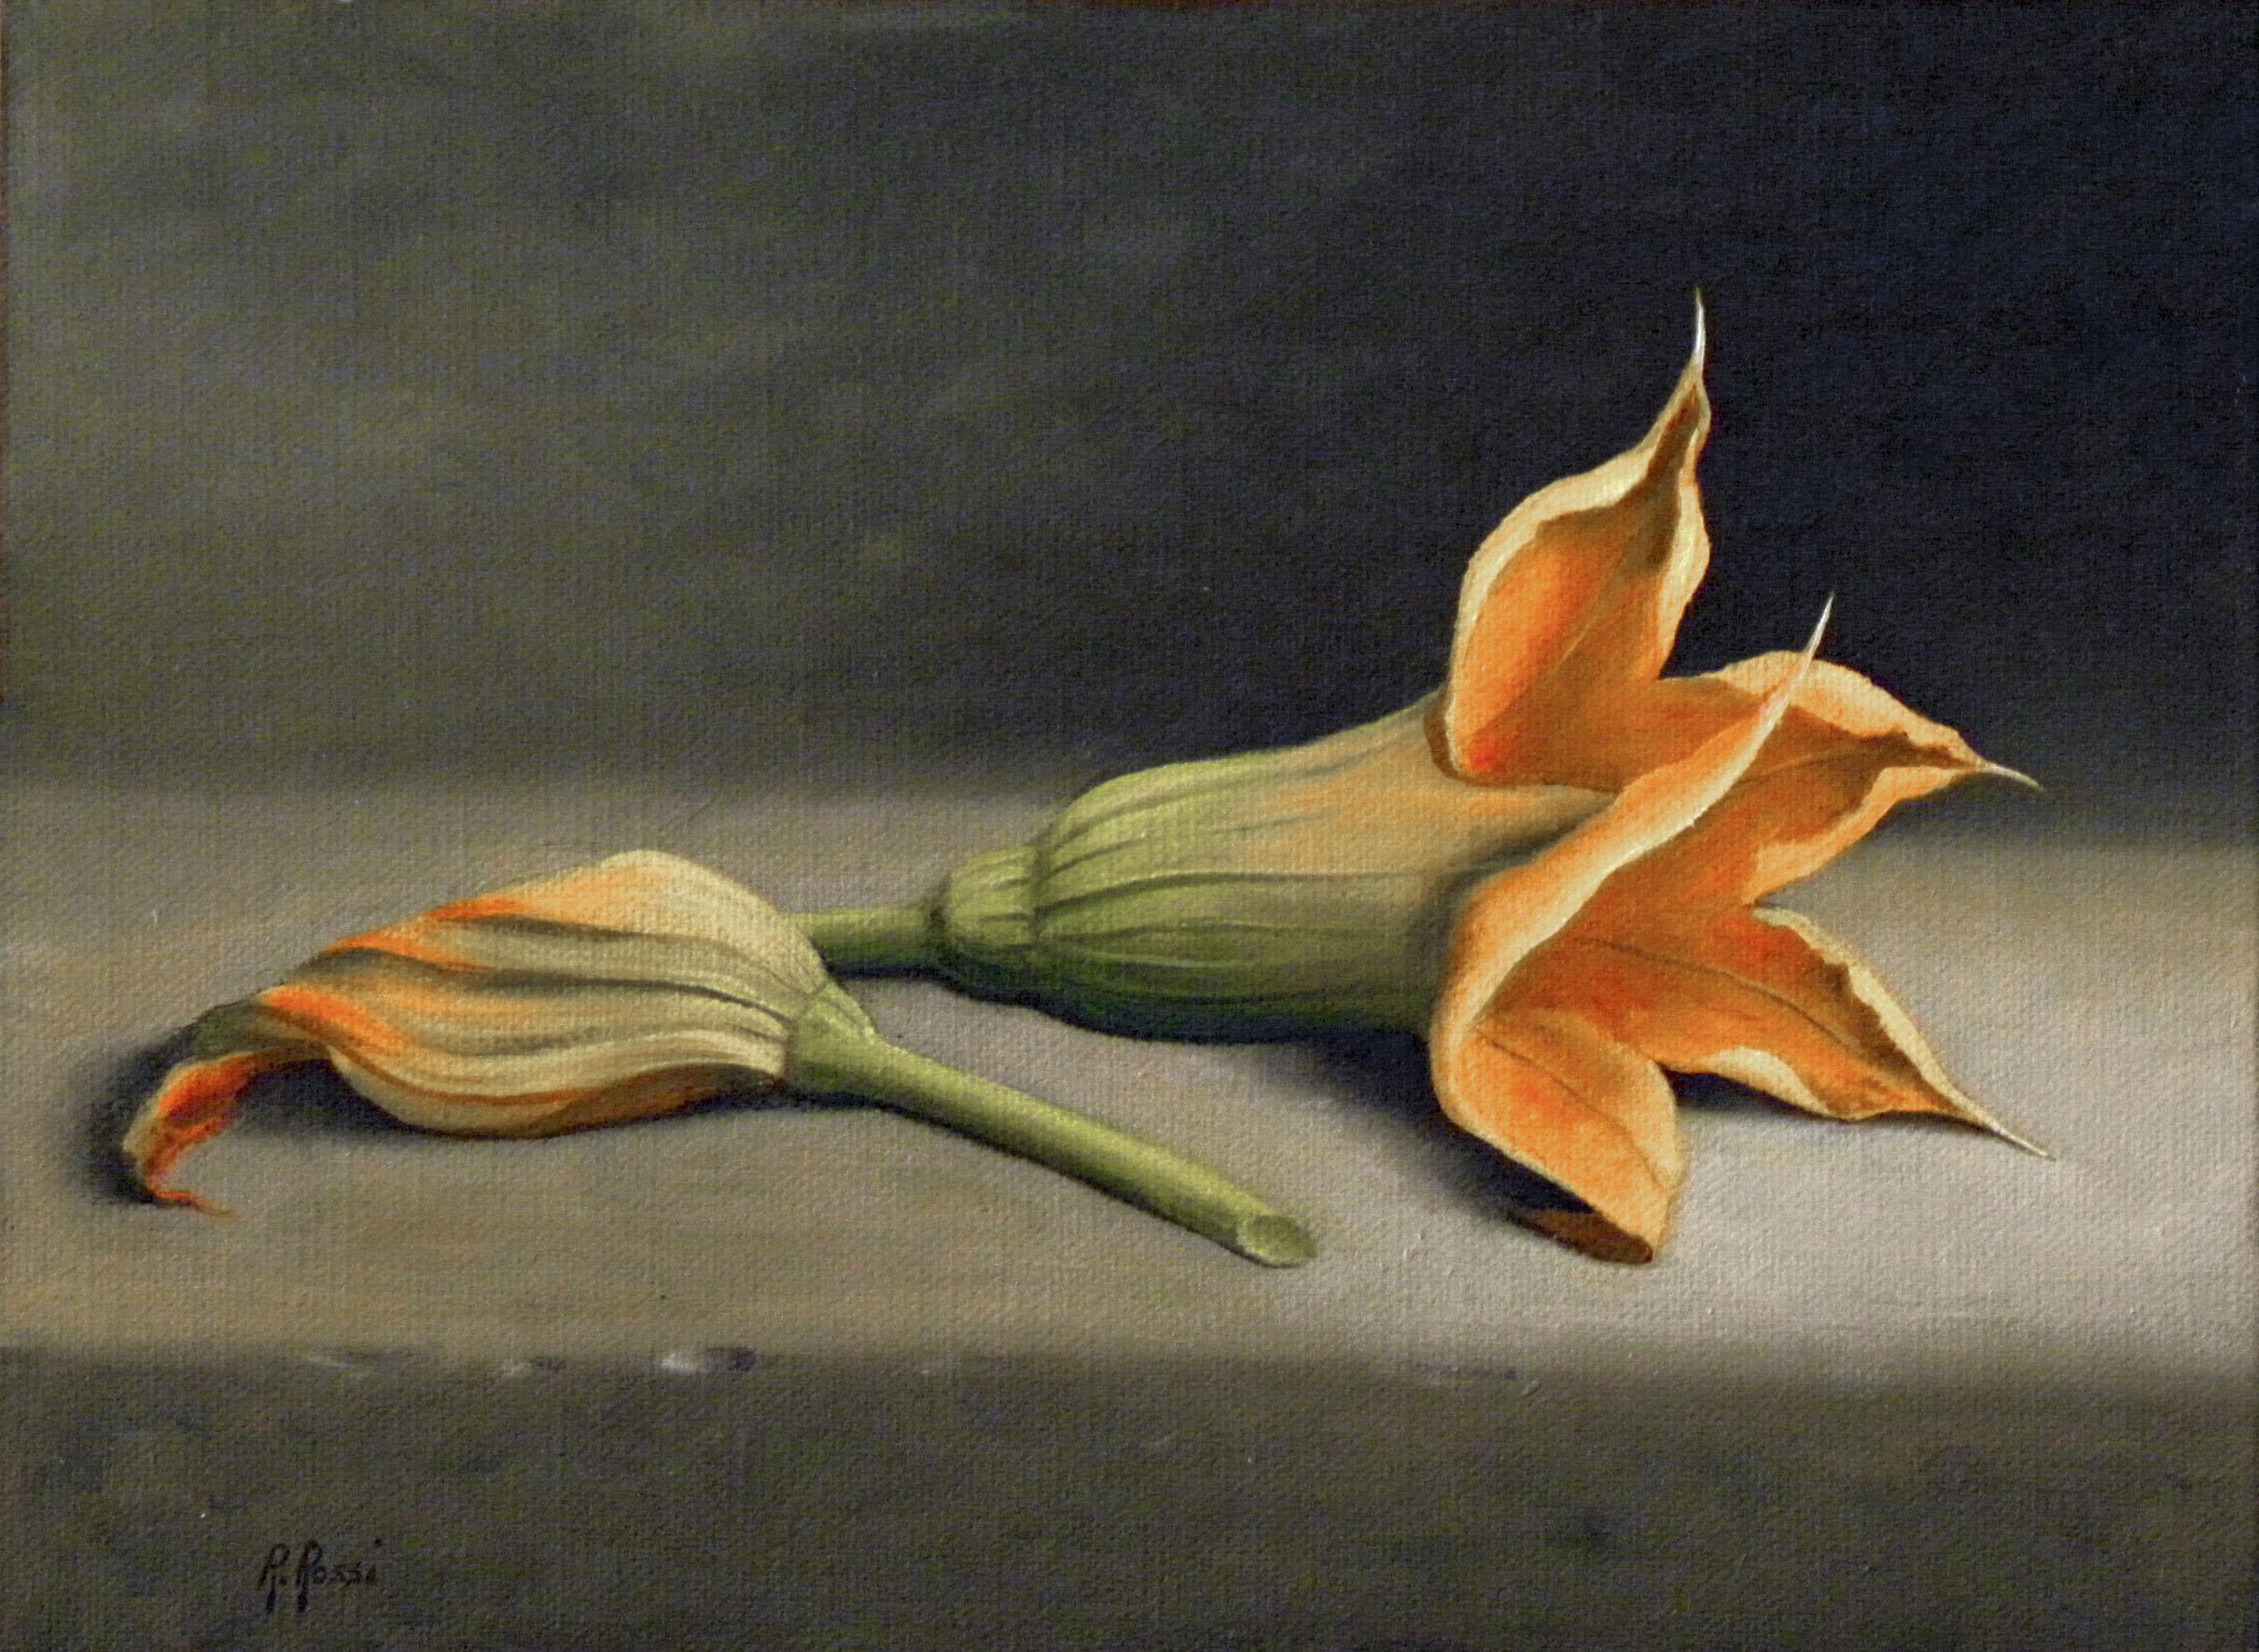 2015 roberta rossi - fiori di zucchina - olio su tela applicata a cartone - 18 x 24